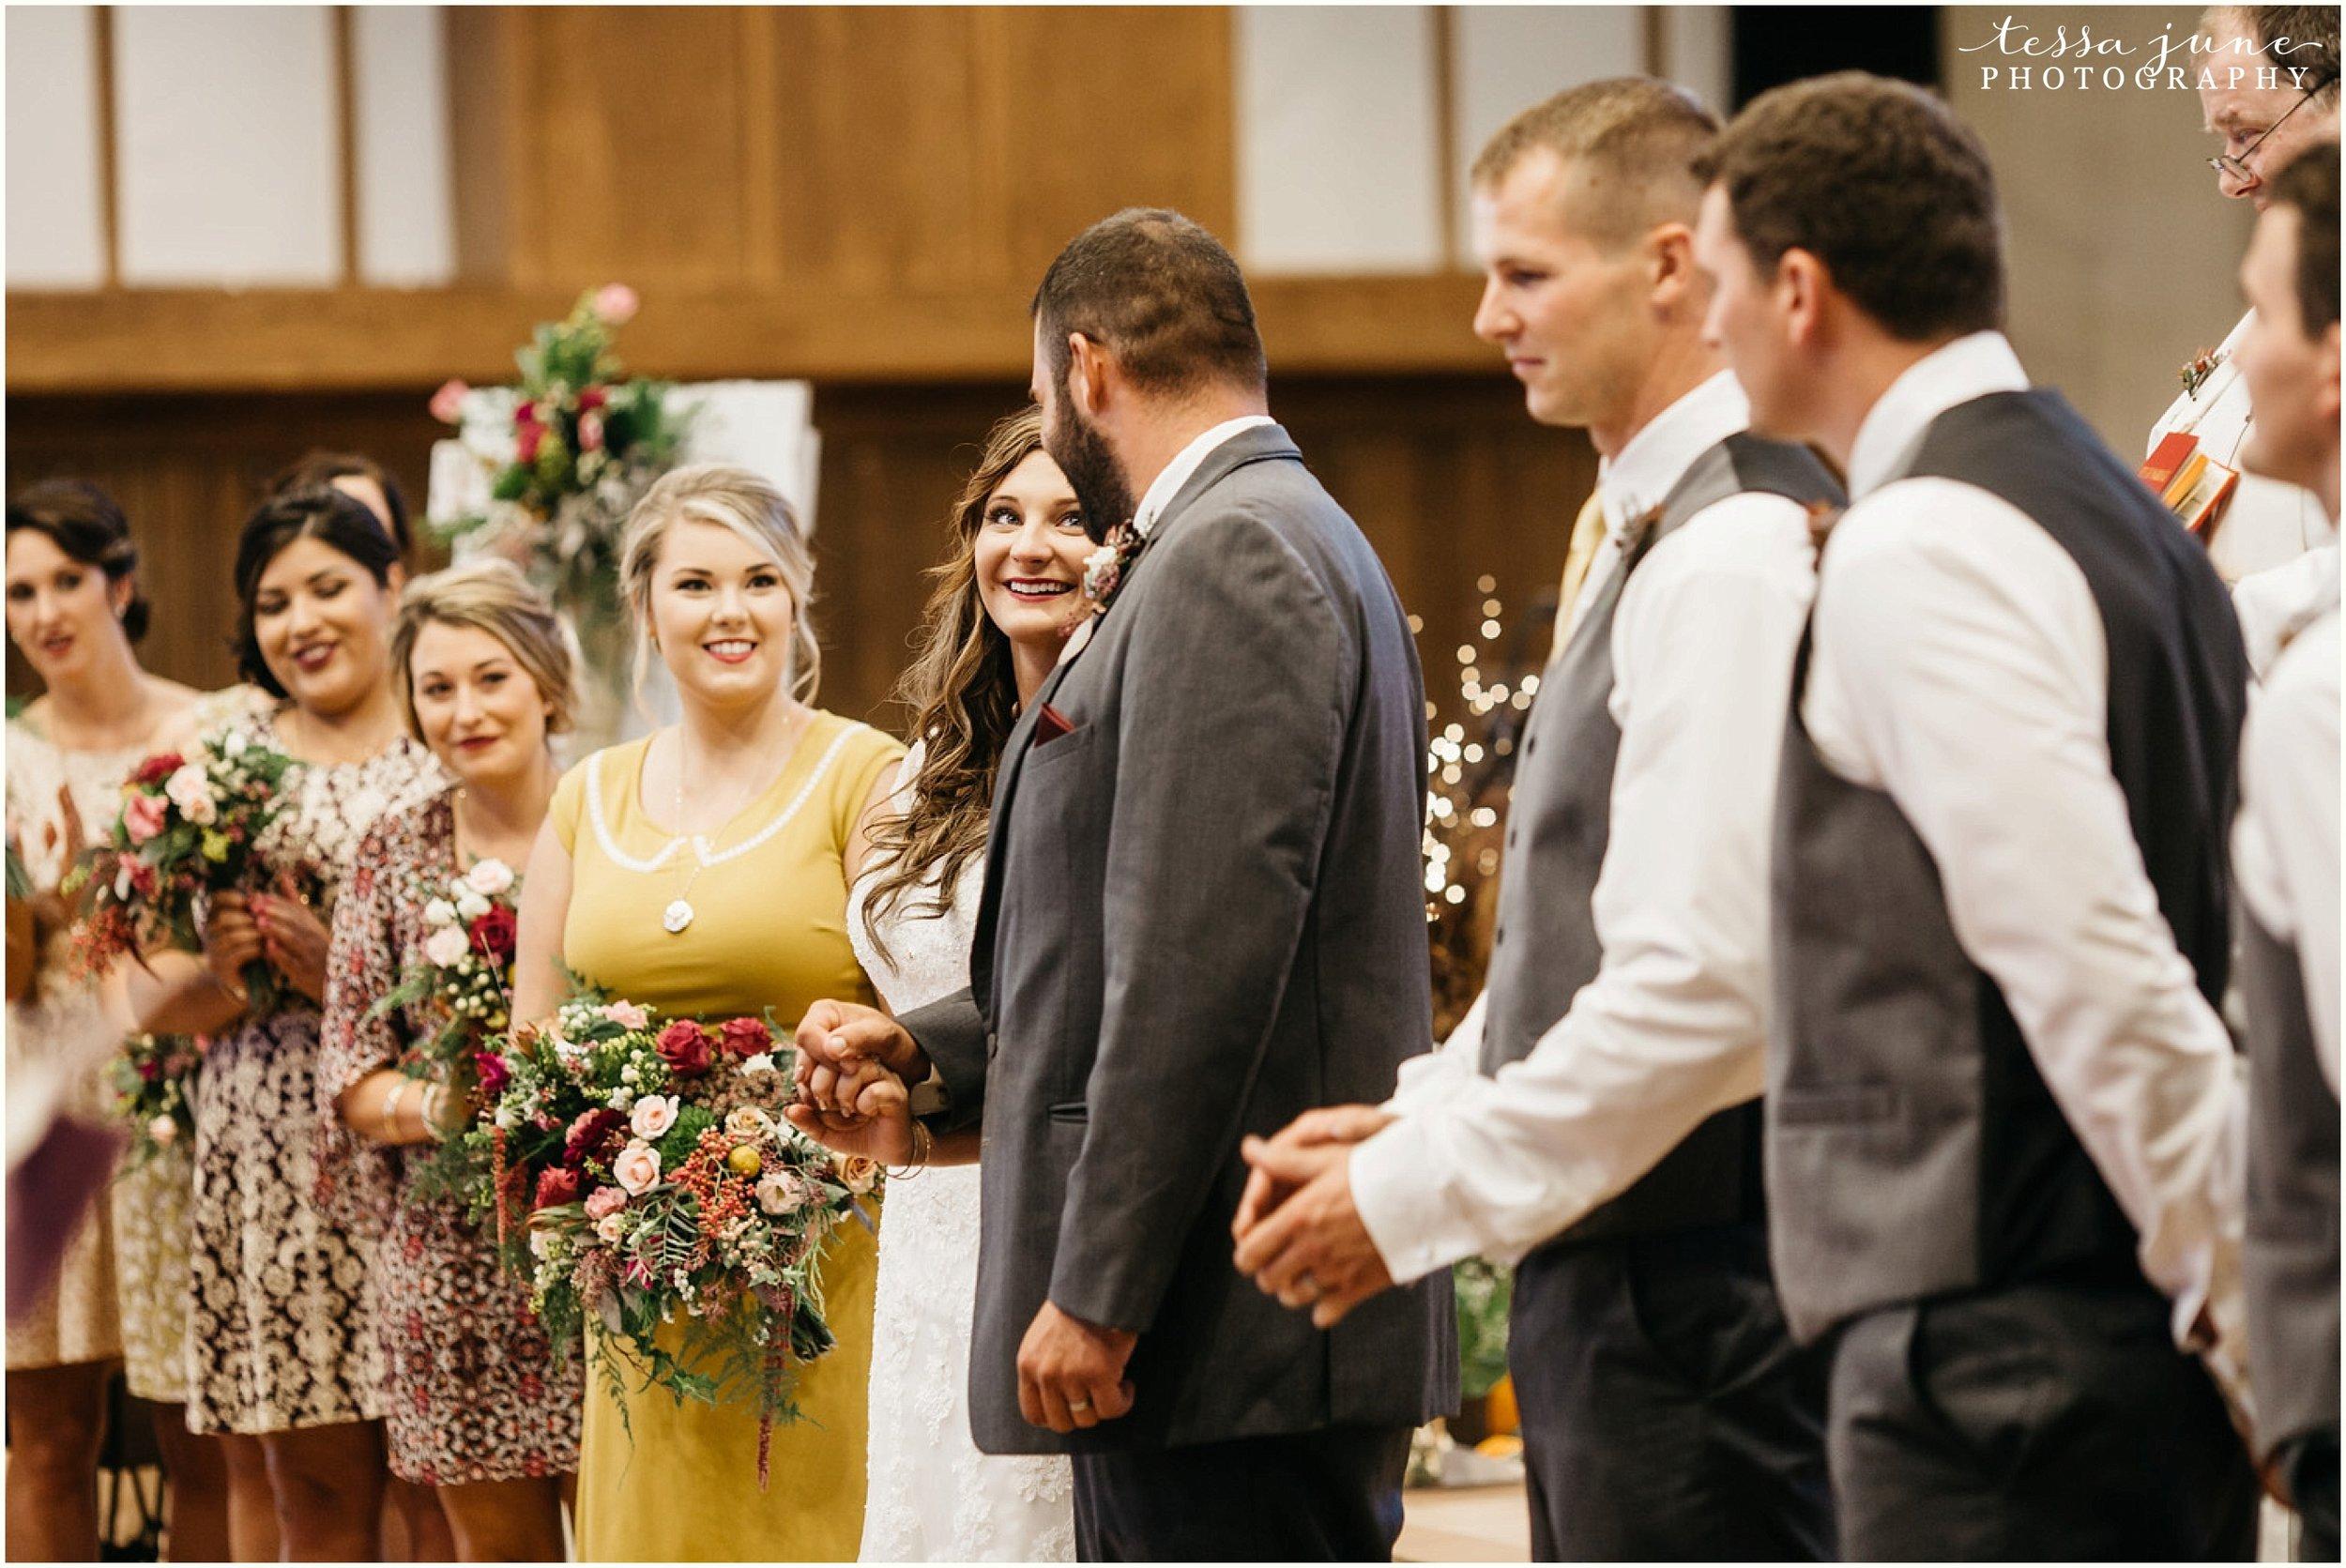 bohemian-minnesota-wedding-mismatched-bridesmaid-dresses-waterfall-st-cloud-tessa-june-photography-115.jpg